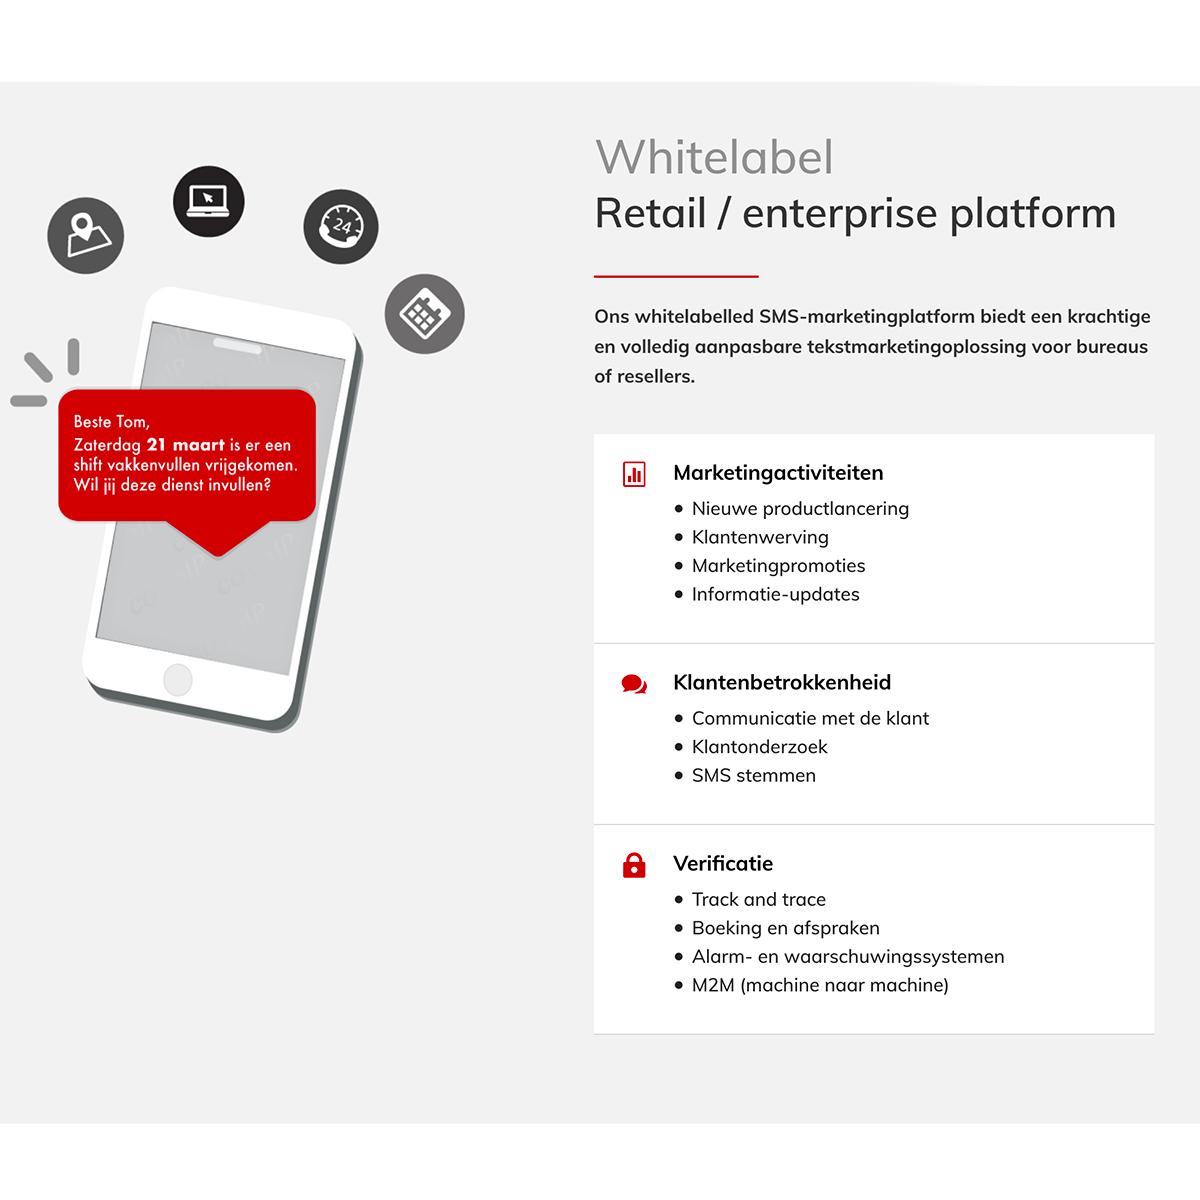 coVoIP™ whitelabel platform